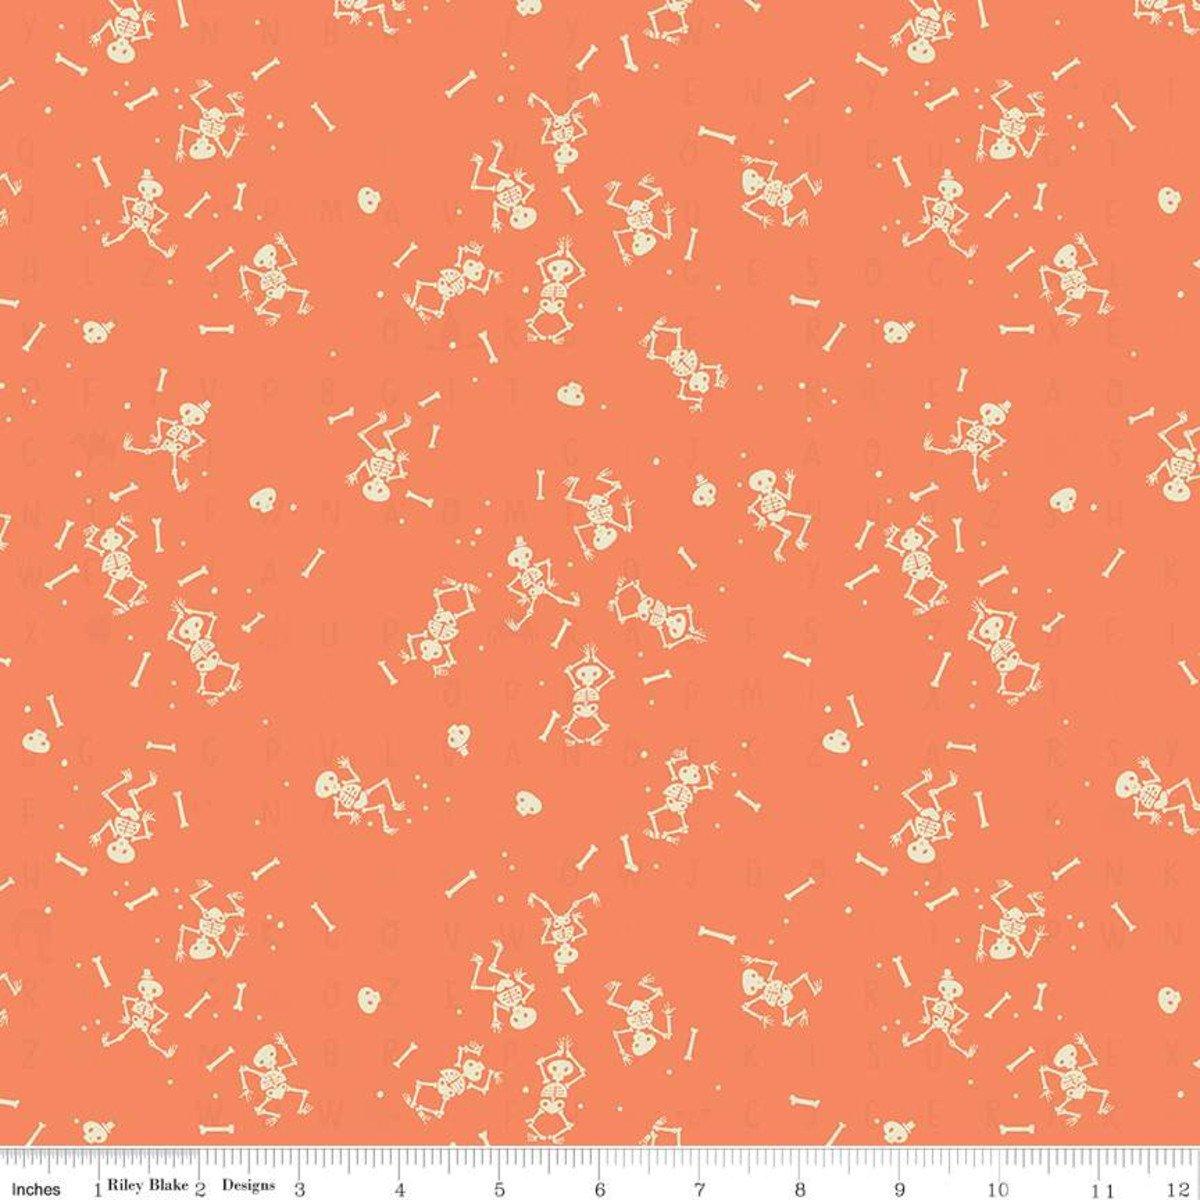 Tiny Treaters - Skeletons - Orange